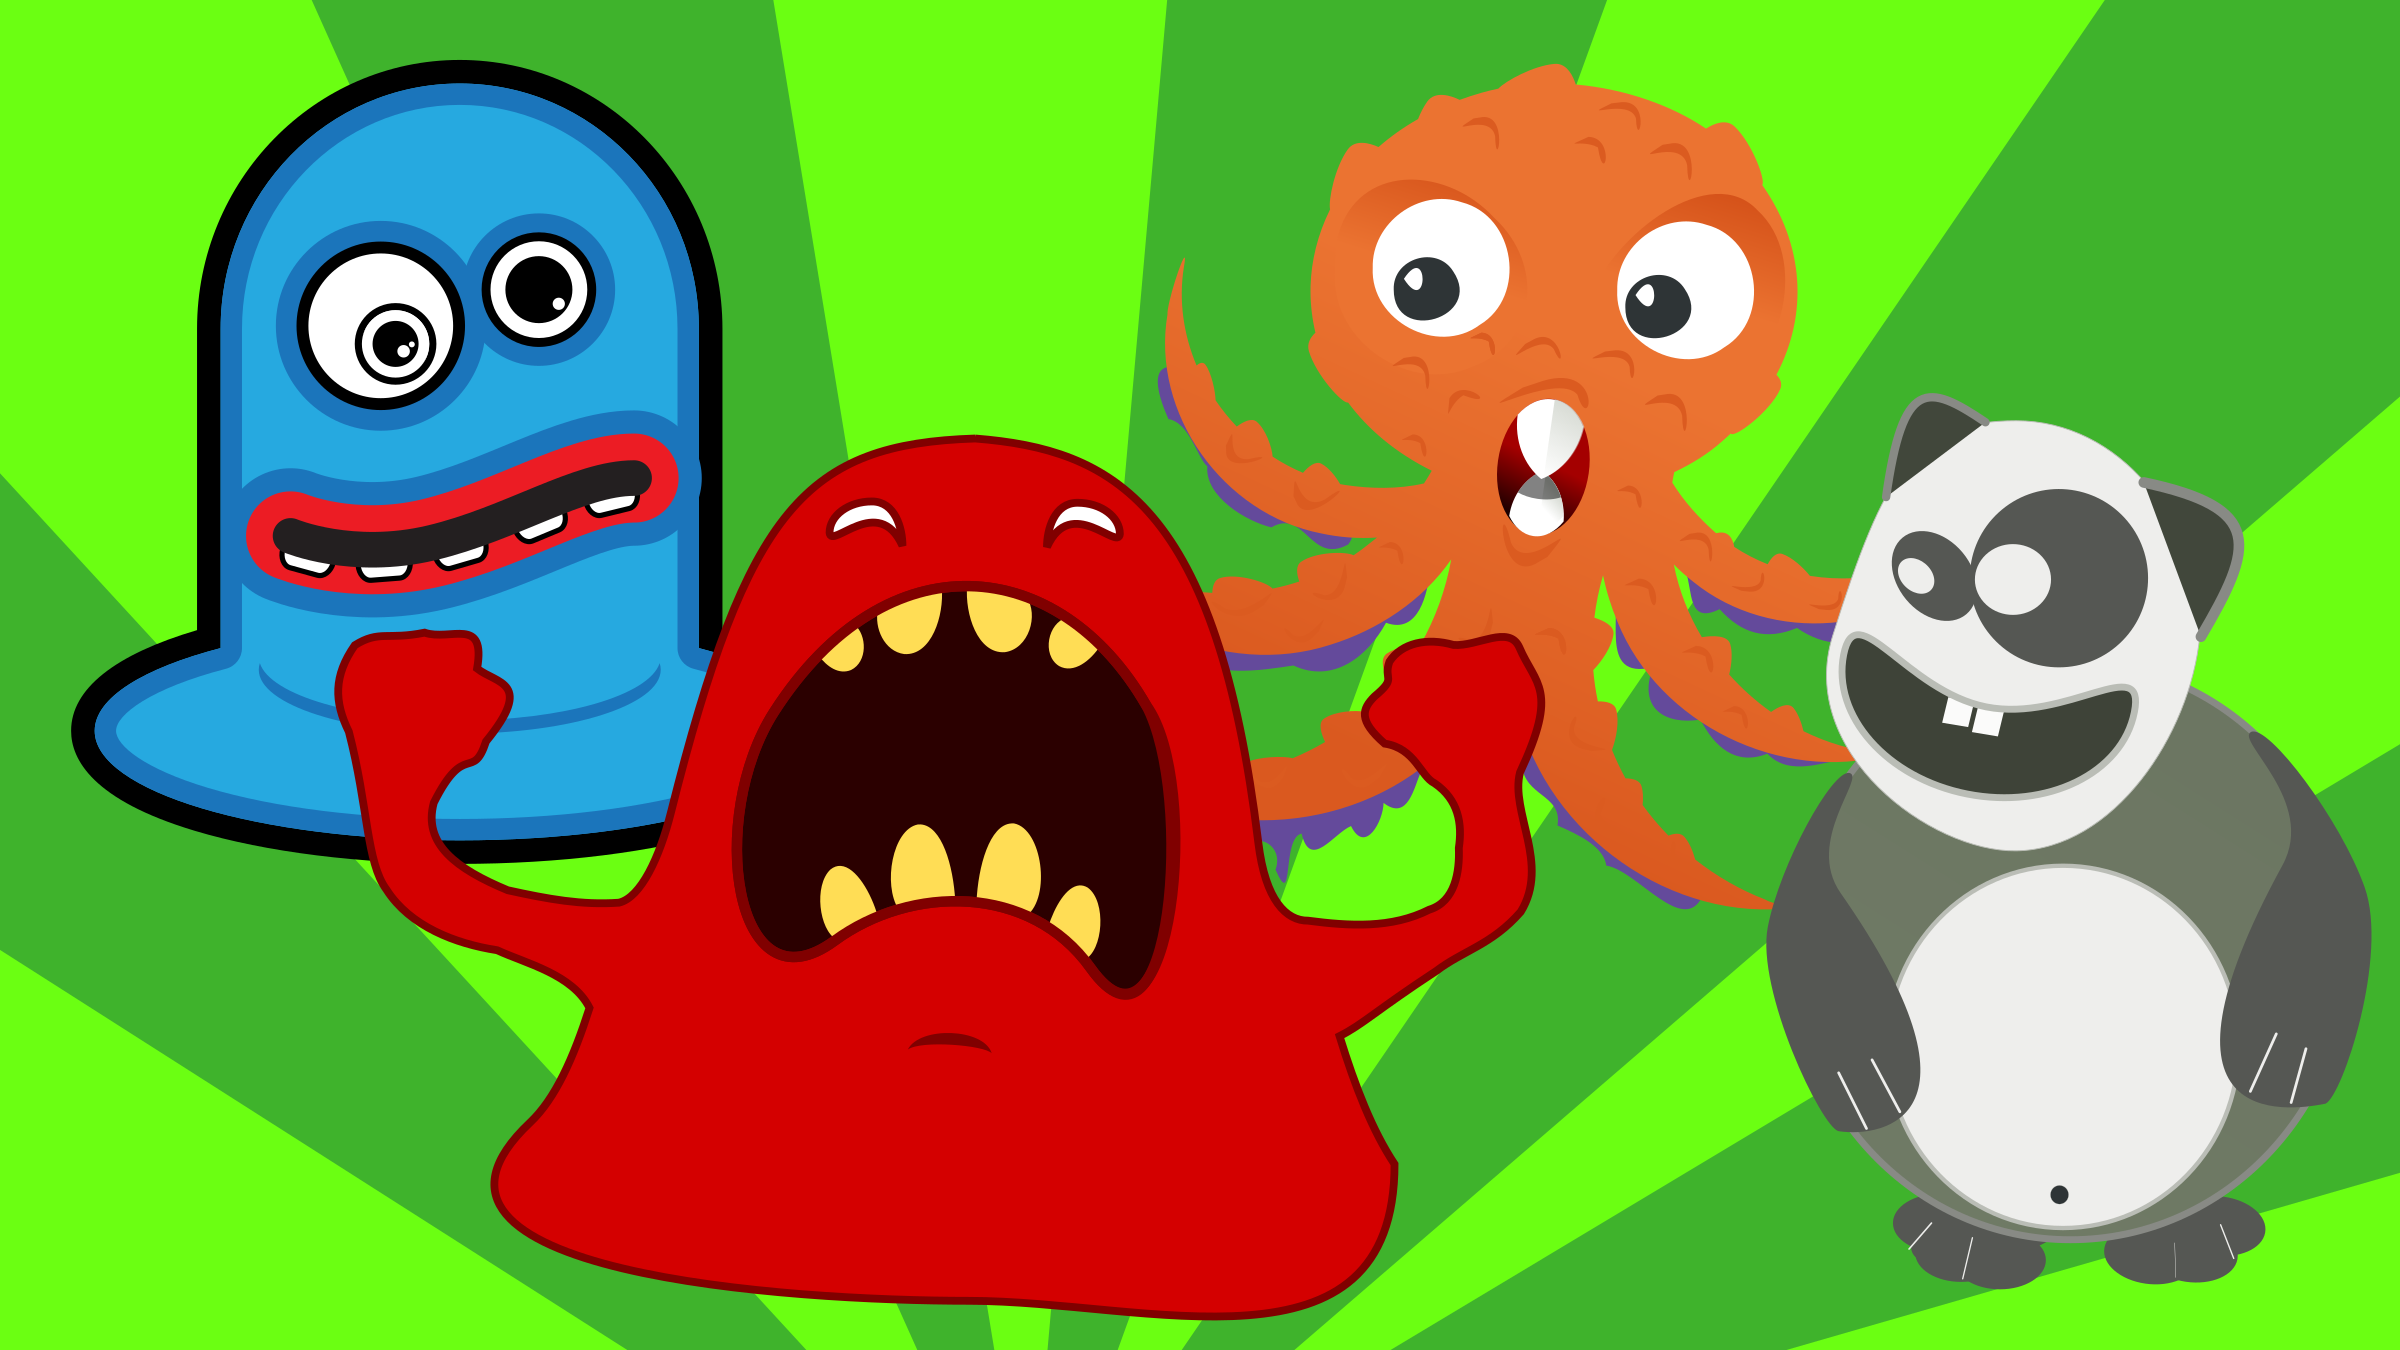 clipart weird monster creature party clipart octapus clip art octopus free